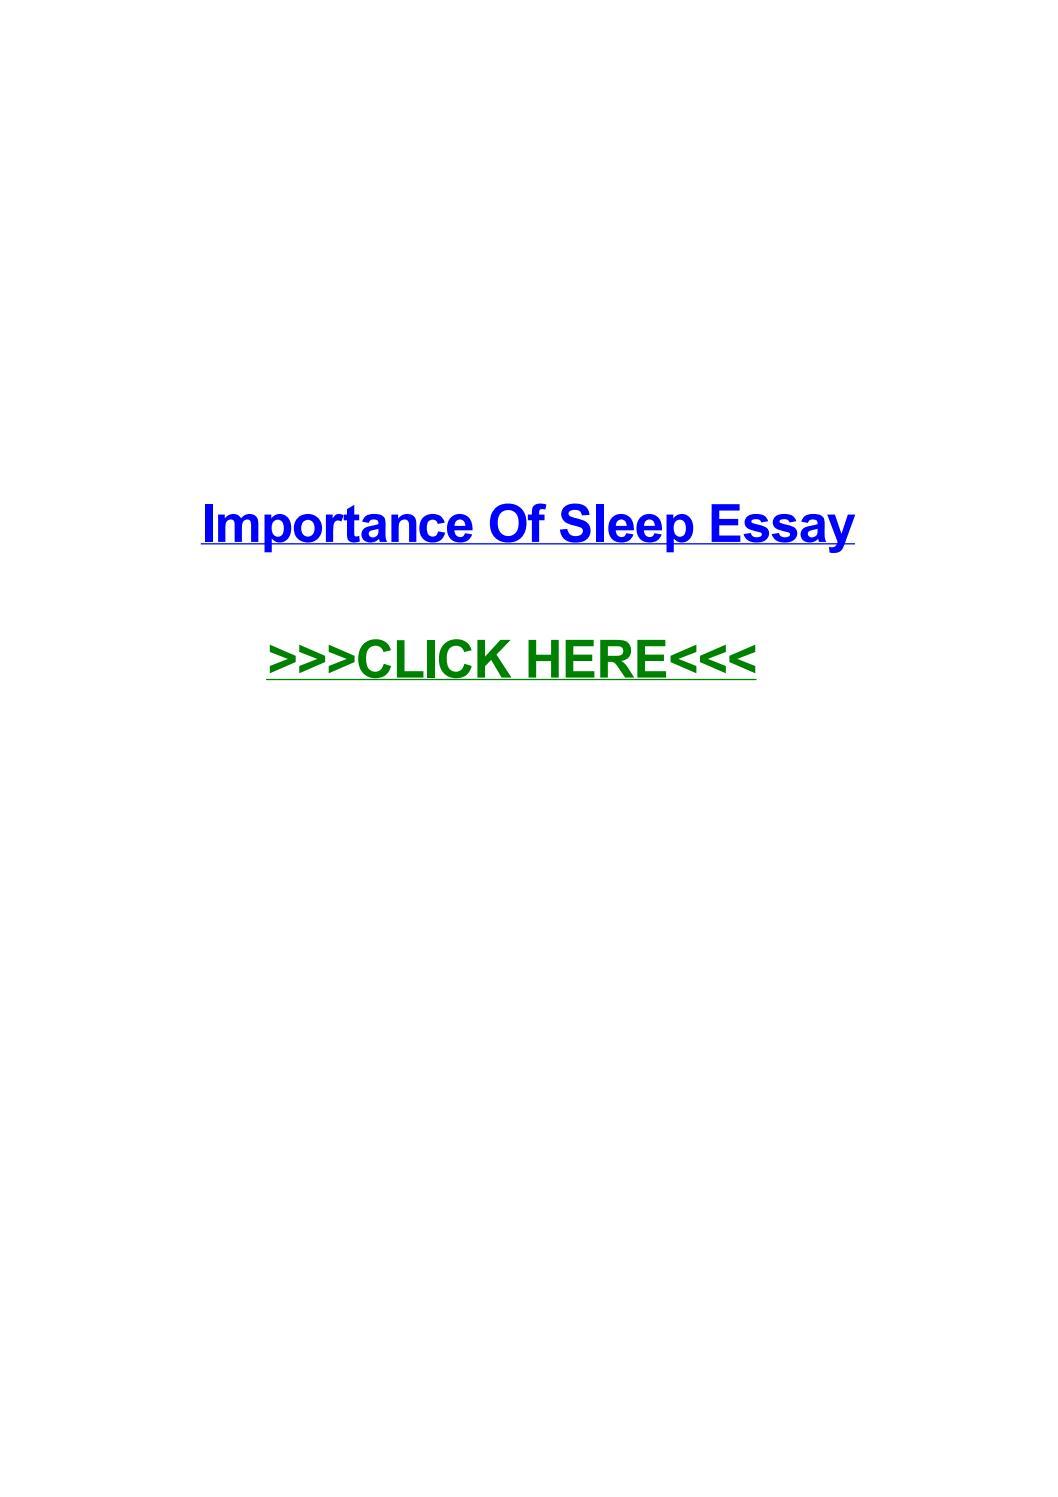 003 Importance Of Sleep Essay Page 1 Breathtaking Pdf Spm Speech Full